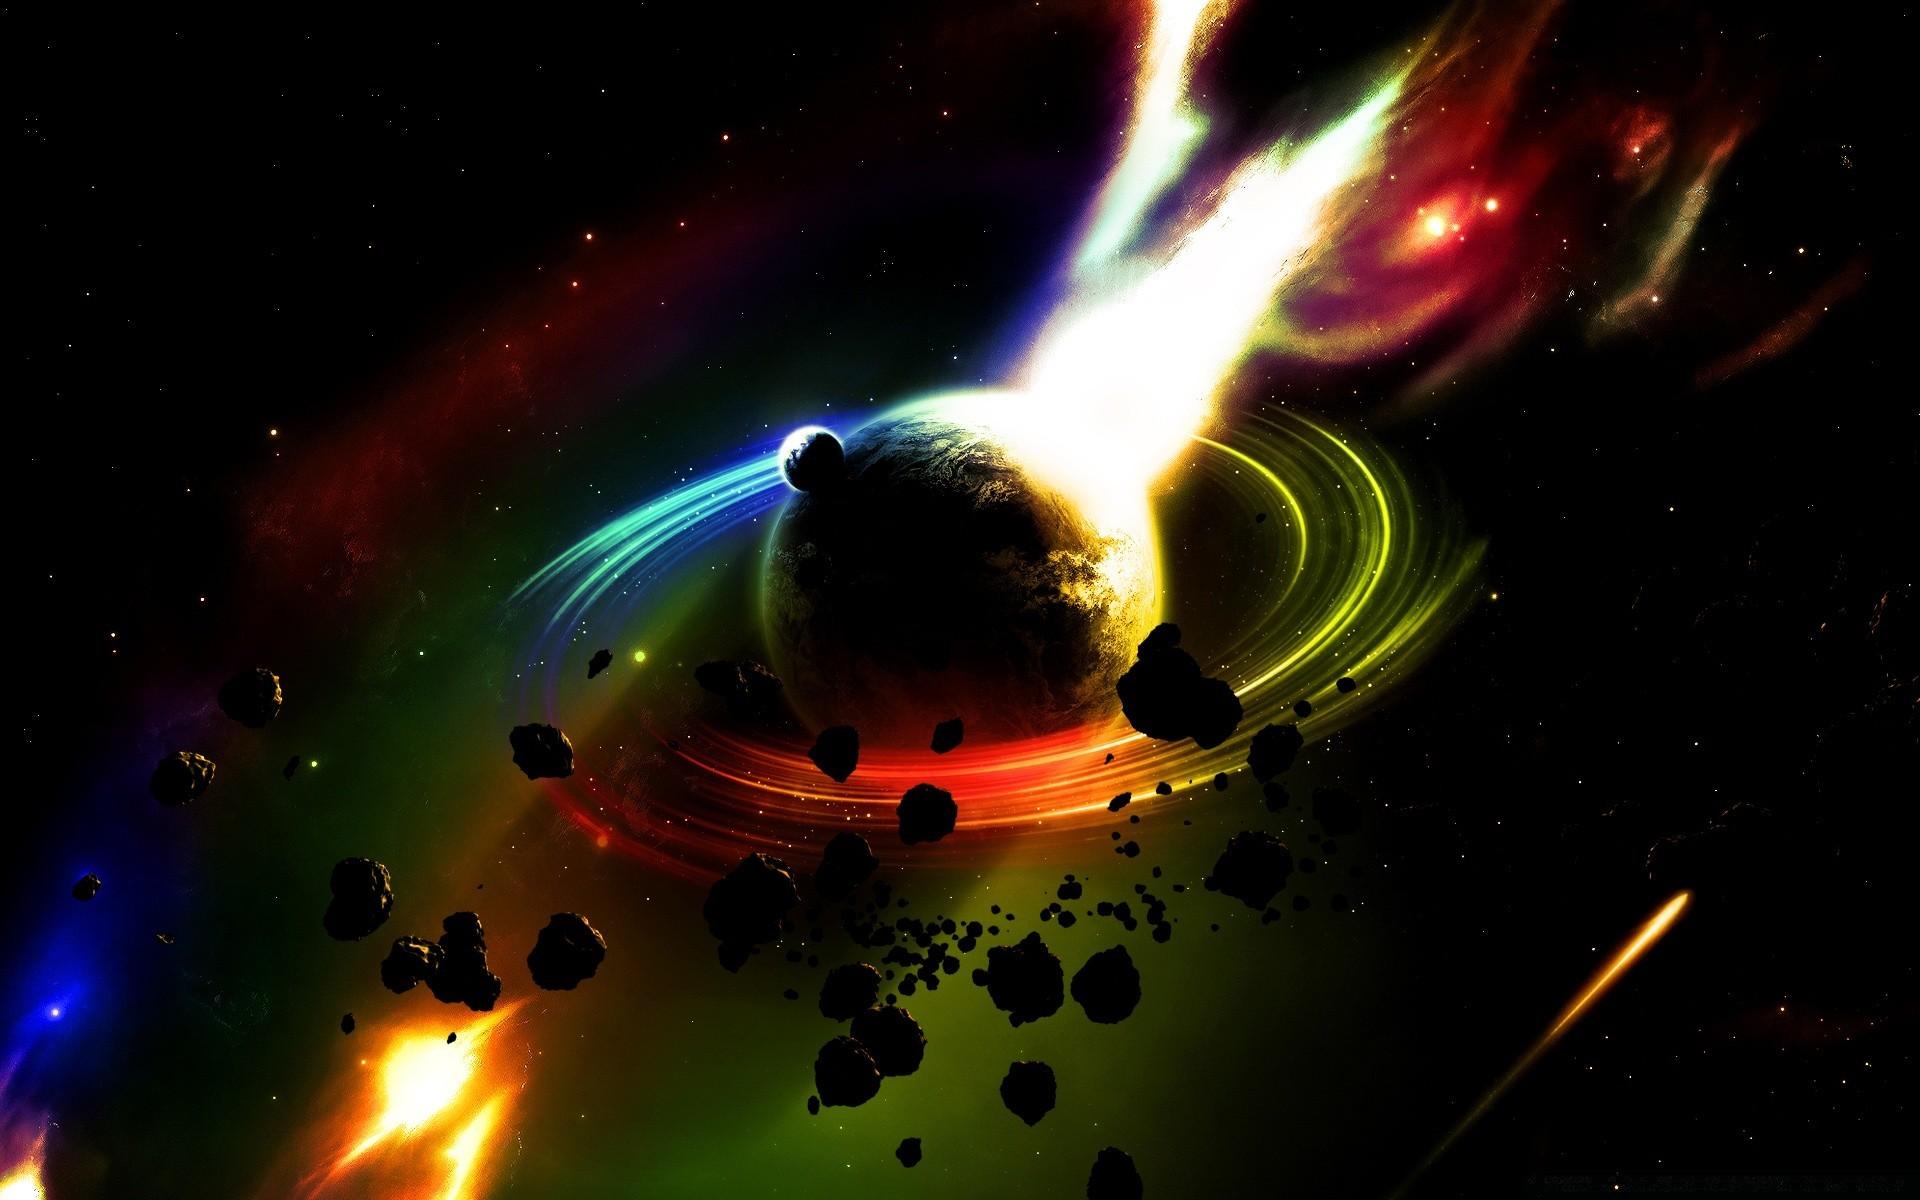 Обои Explosion, взрыв, space, Meteorite, метеорит. Космос foto 11